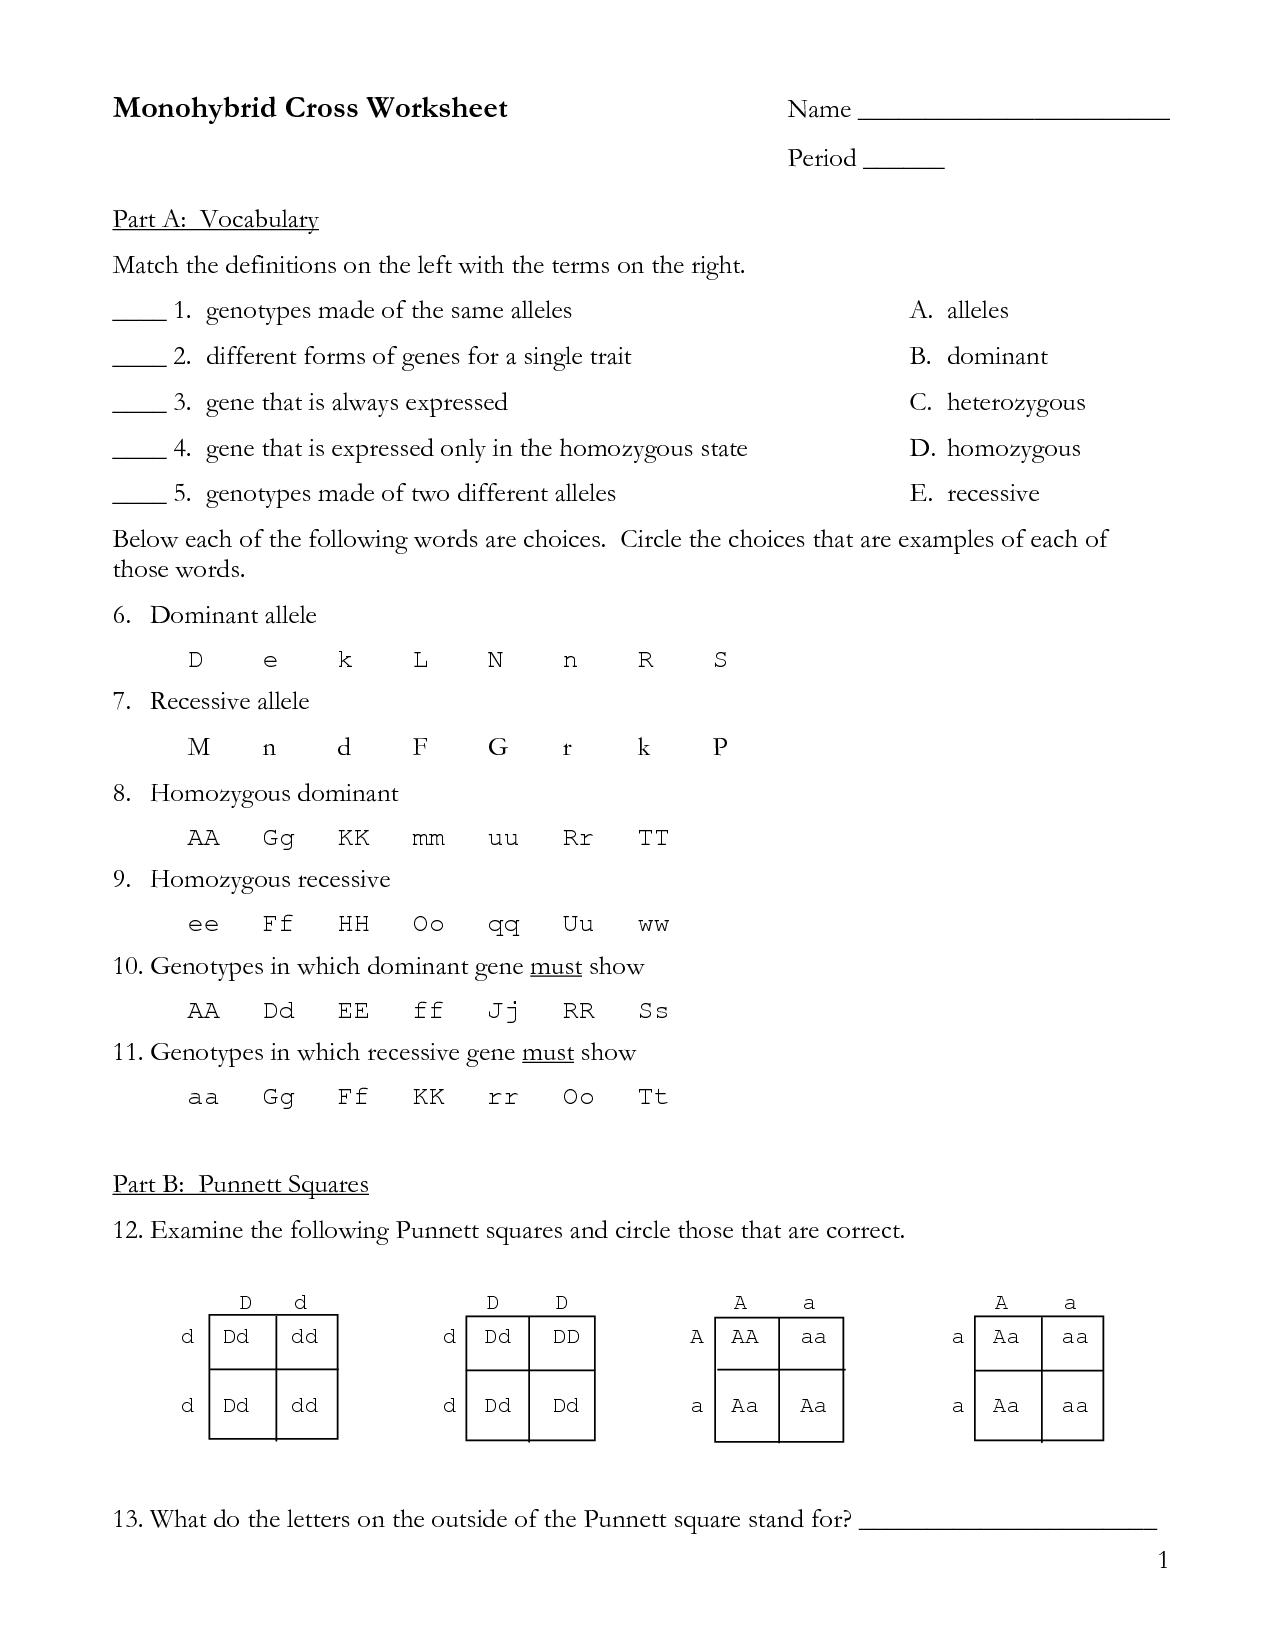 30 Monohybrid Crosses Practice Worksheet Answer Key